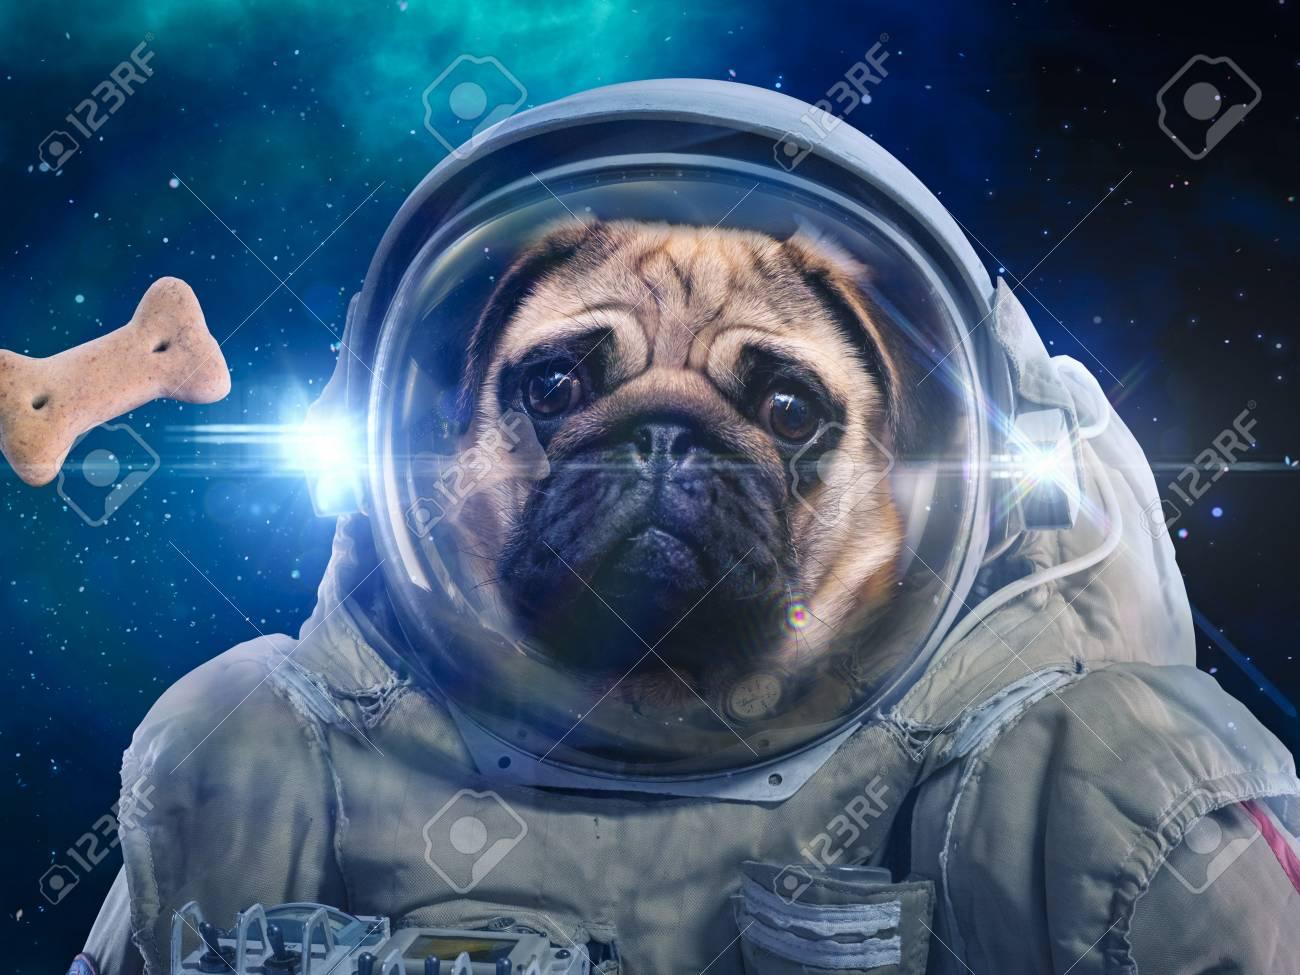 Space dog Stock Photo - 97027270